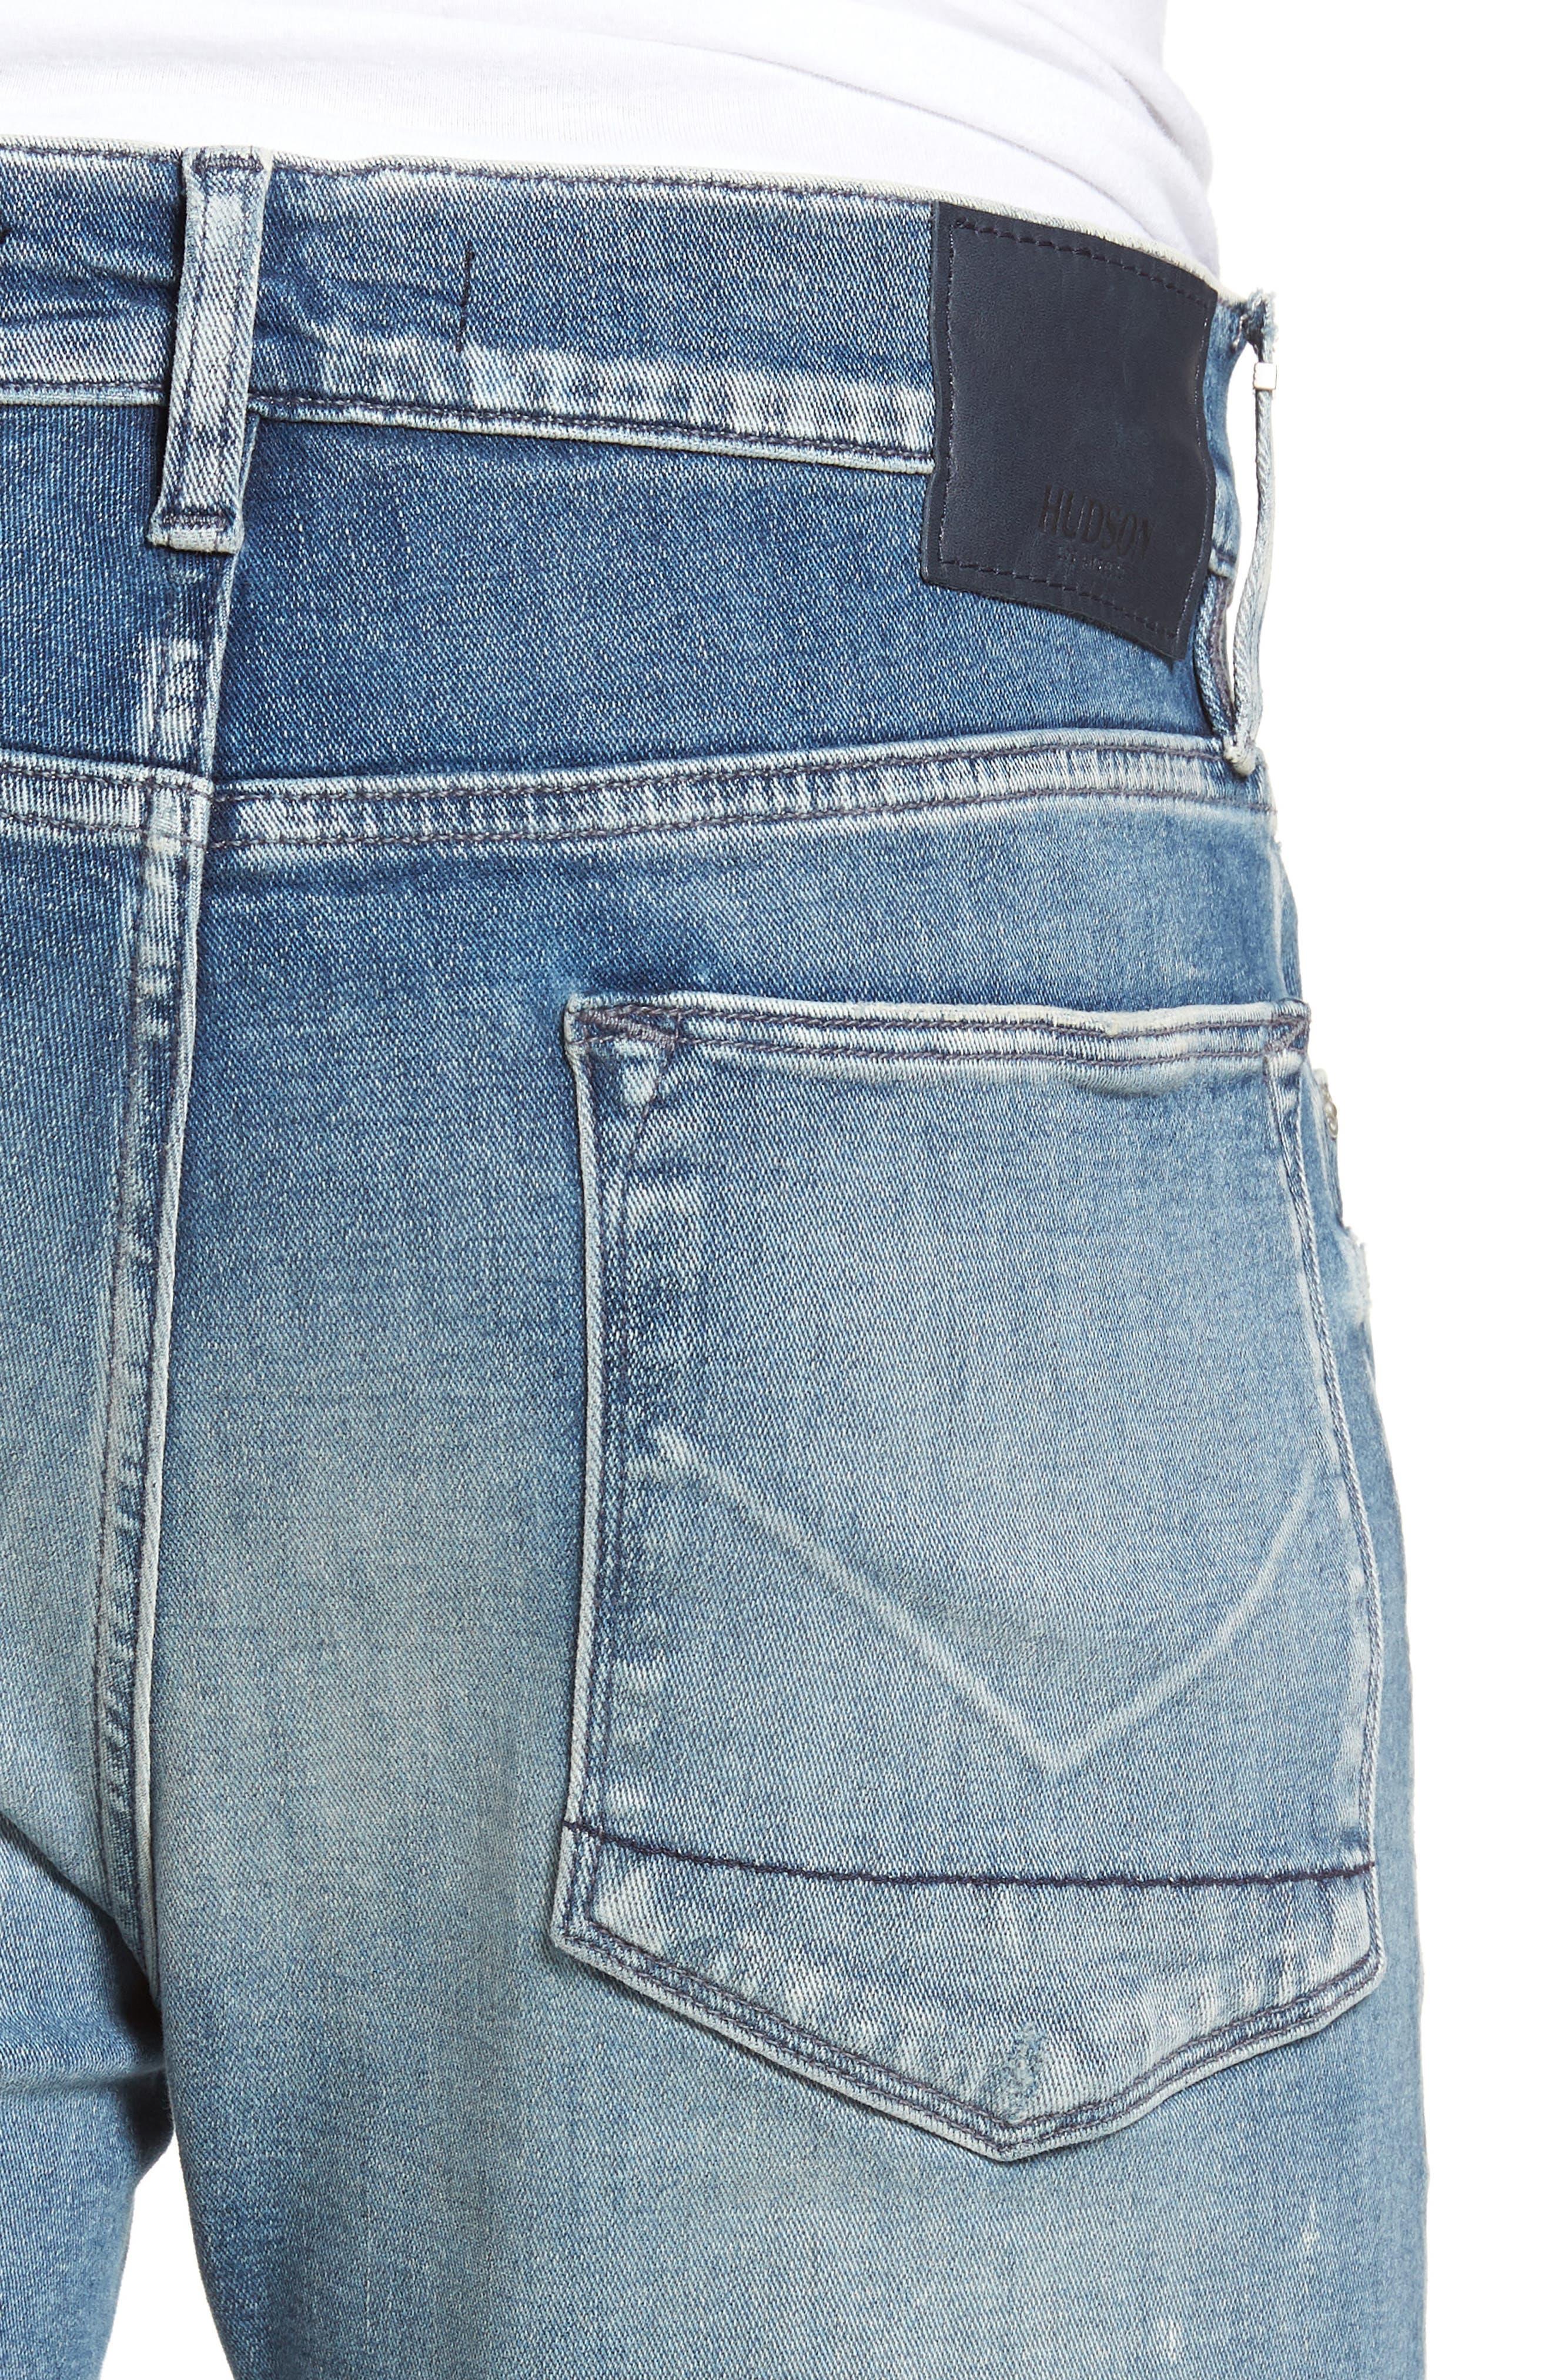 Zack Skinny Fit Jeans,                             Alternate thumbnail 4, color,                             MCNAB